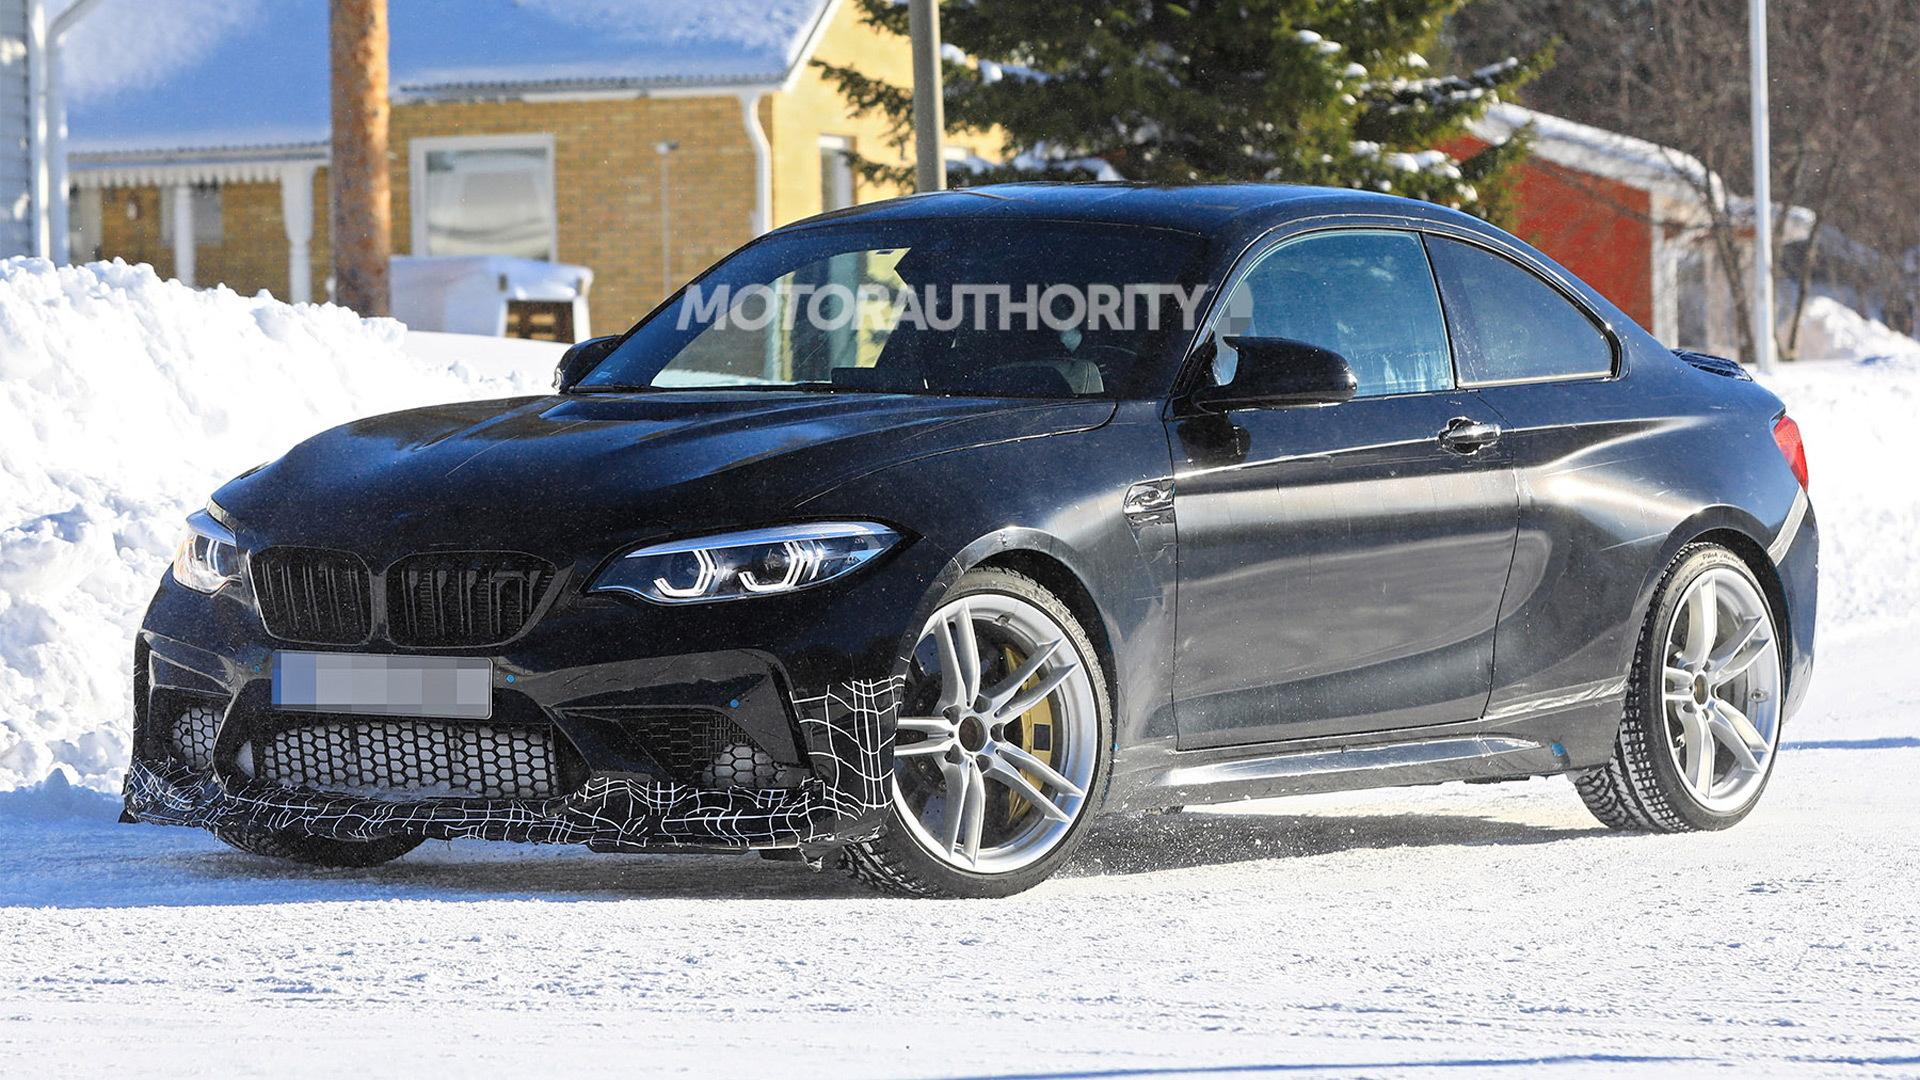 2020 BMW M2 CS spy shots - Image via S. Baldauf/SB-Medien